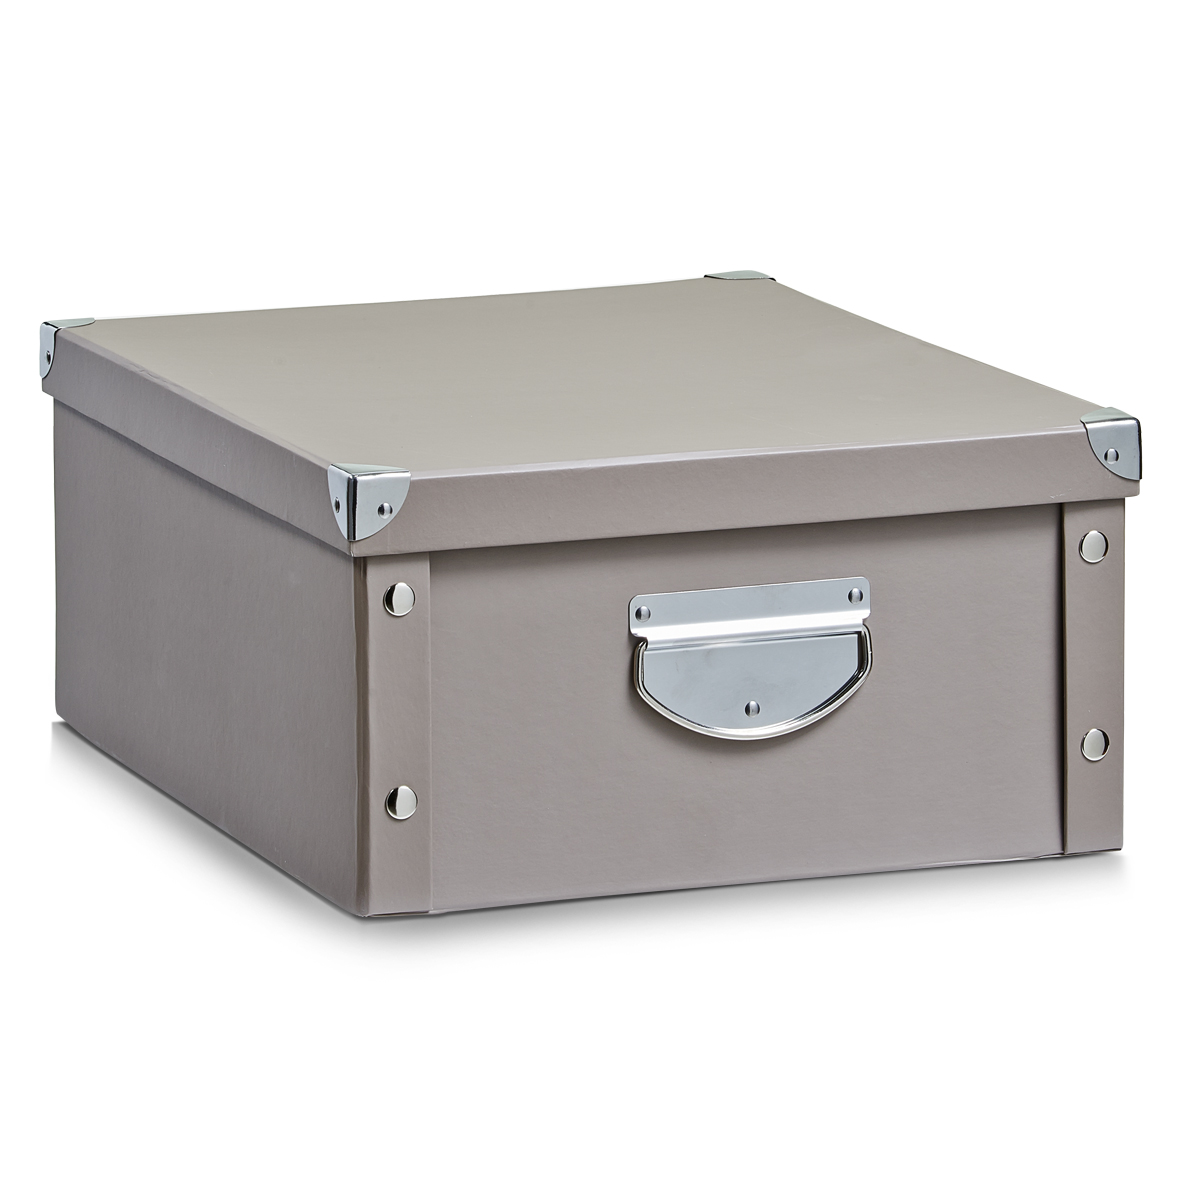 aufbewahrungsbox 40x17x3 cm pappe pappkarton pappschachtel. Black Bedroom Furniture Sets. Home Design Ideas